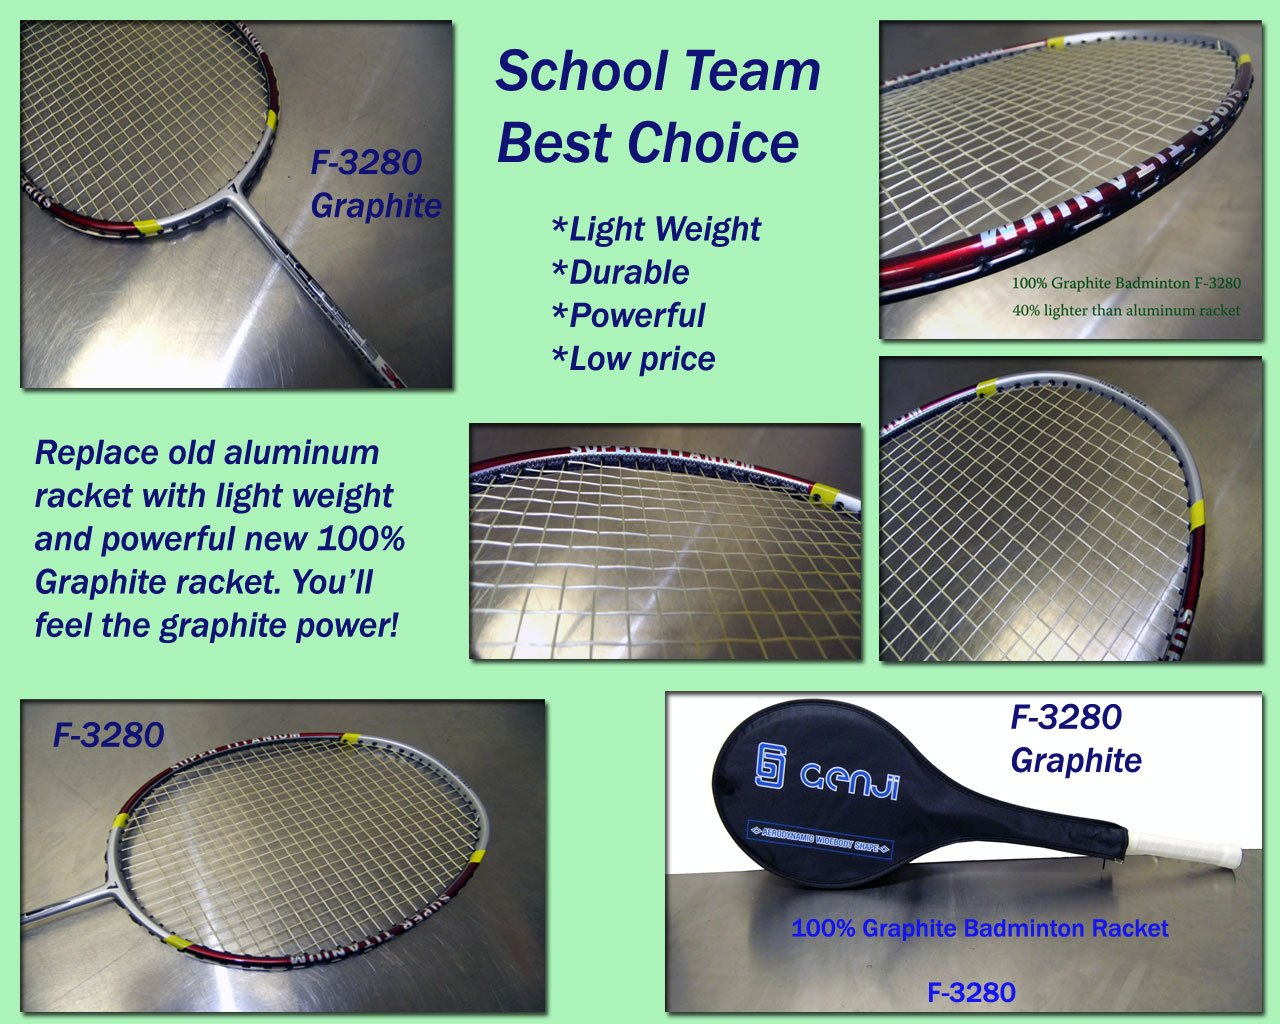 Genji Sports Graphite Badminton Rackets X-Force 3280   B005L4ZROE